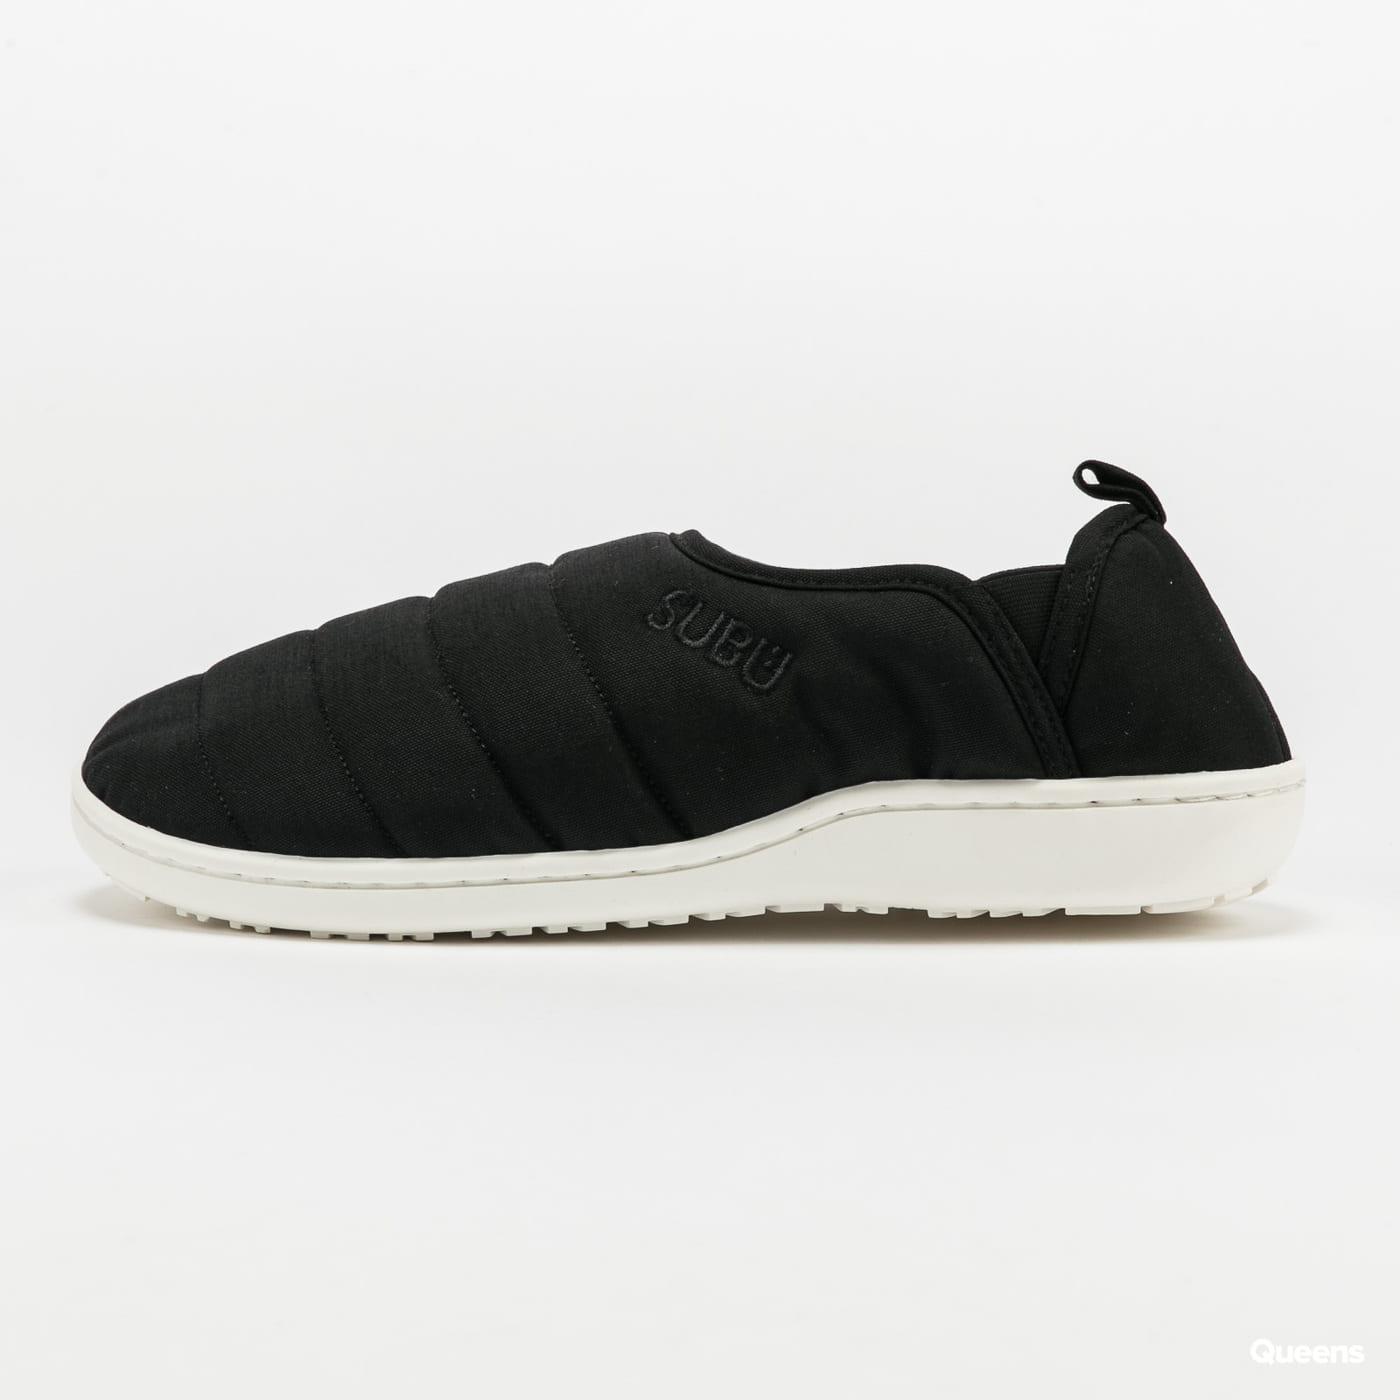 SUBU The Winter Sandals mono black